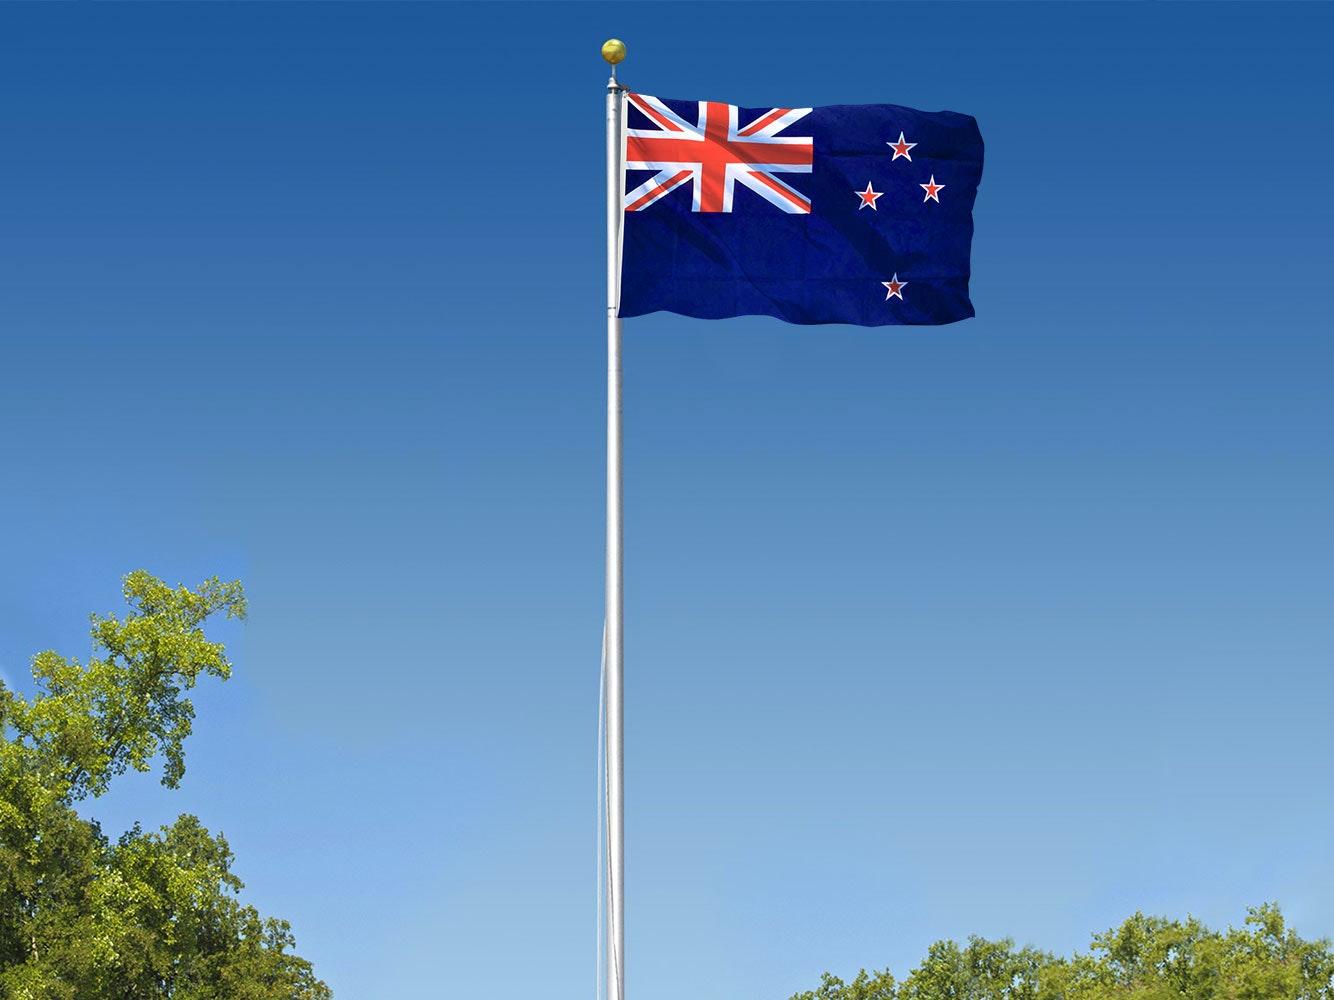 Flagpole Sectional 7.6m